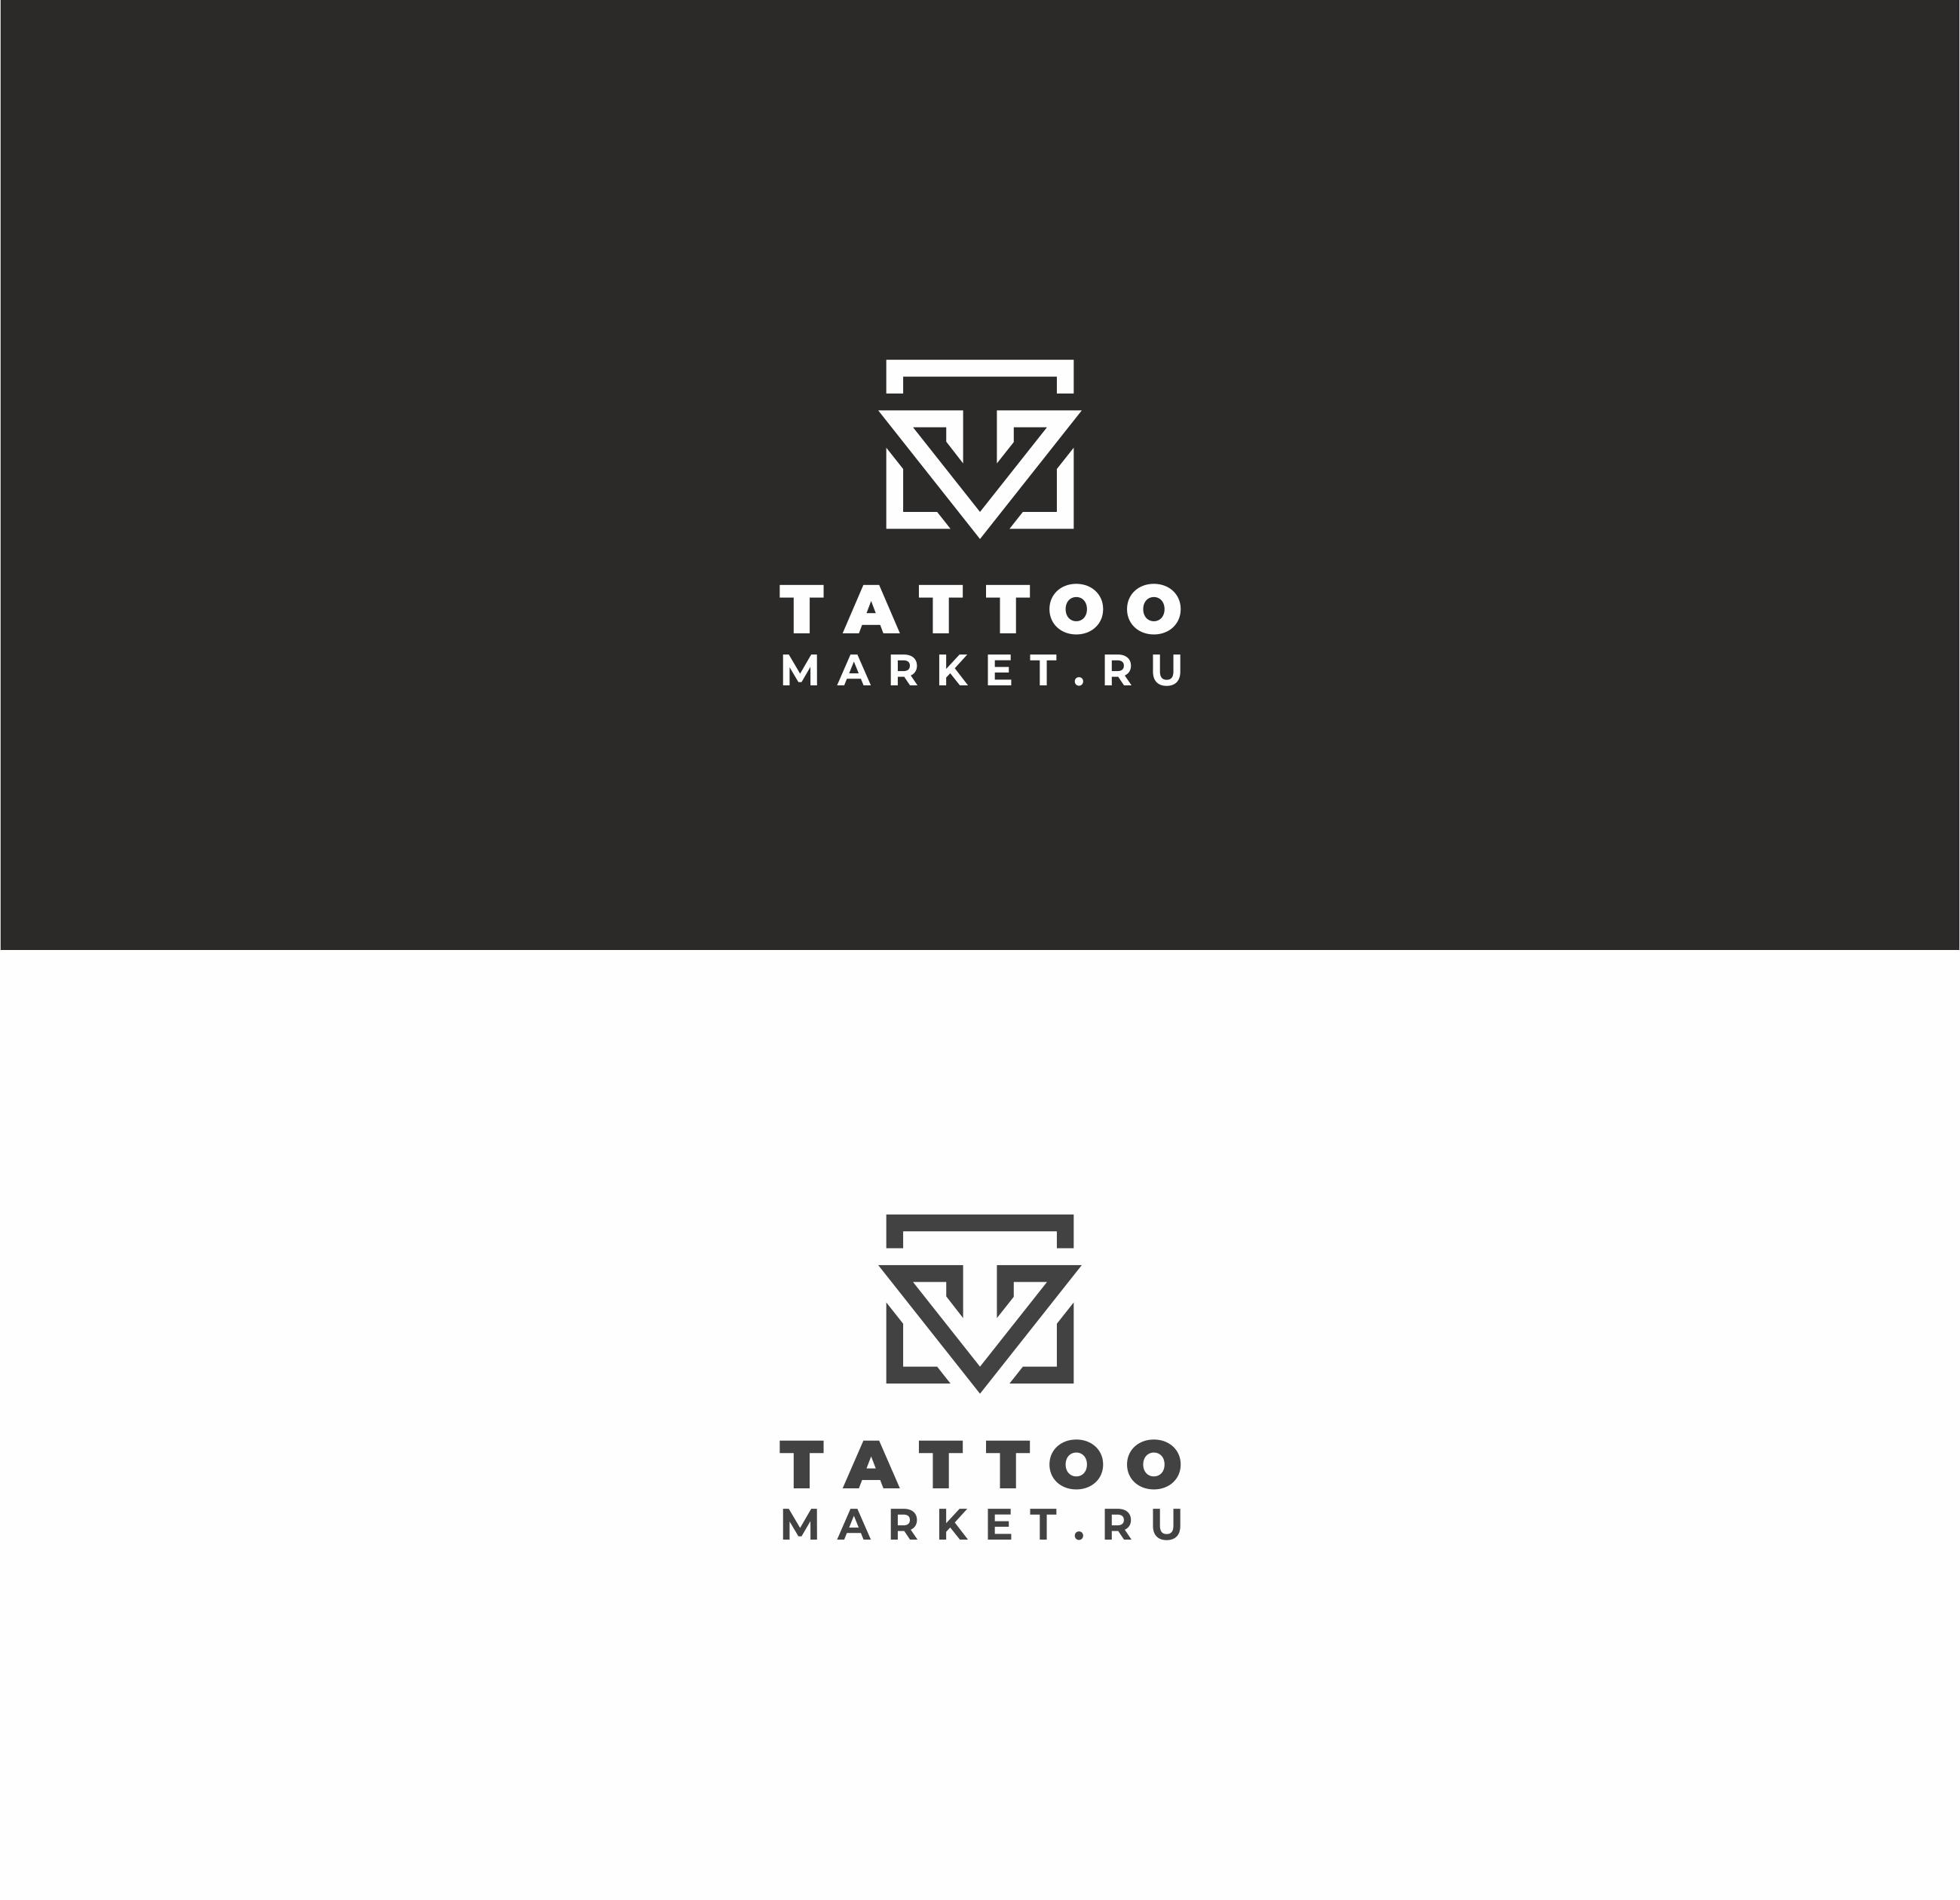 Редизайн логотипа магазина тату оборудования TattooMarket.ru фото f_3075c3d9bd39019c.jpg